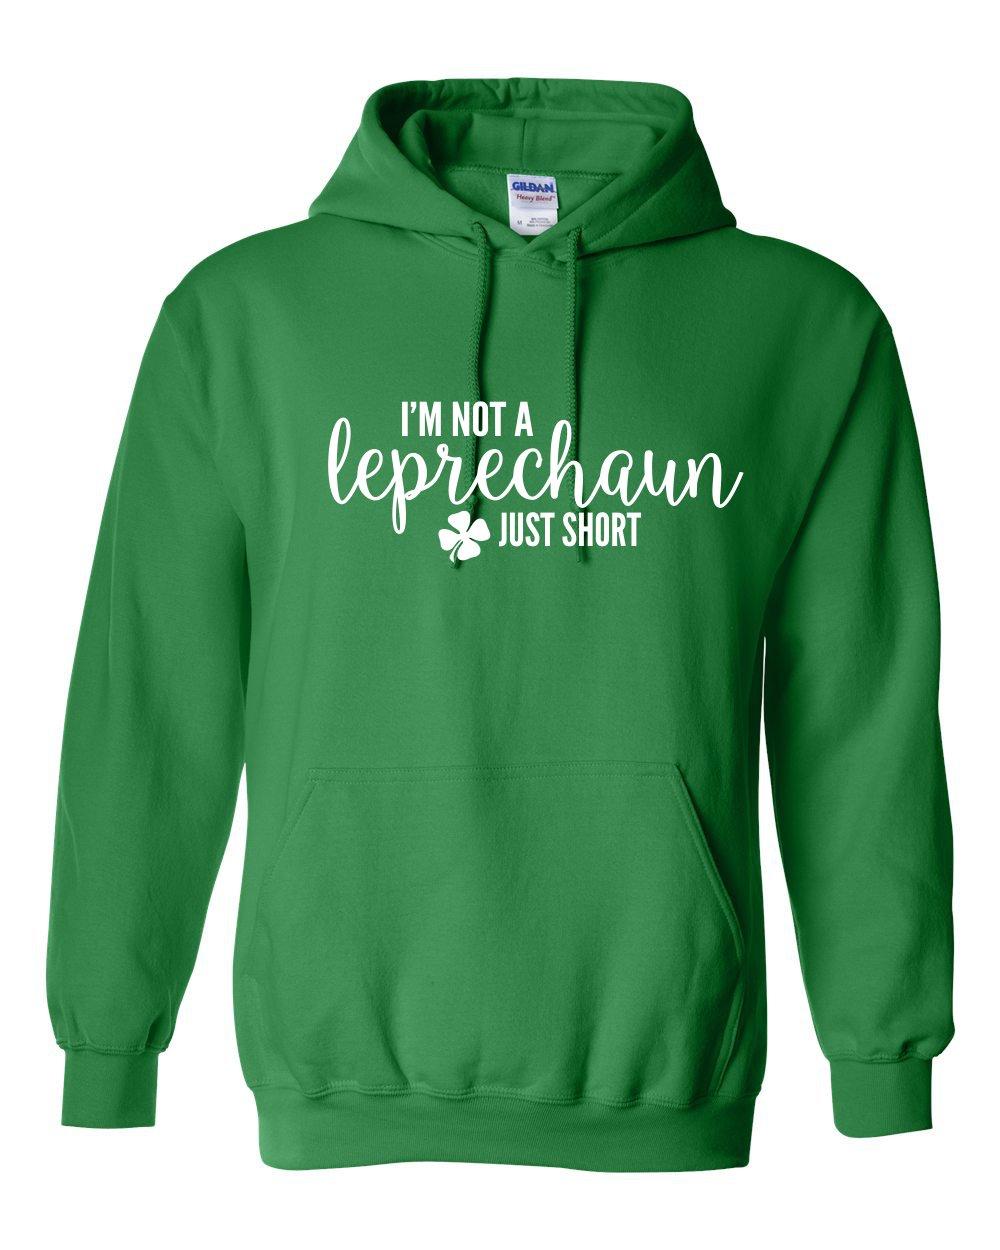 I'm Not a Leprechaun Just Short - Warm Heavy Hoodie